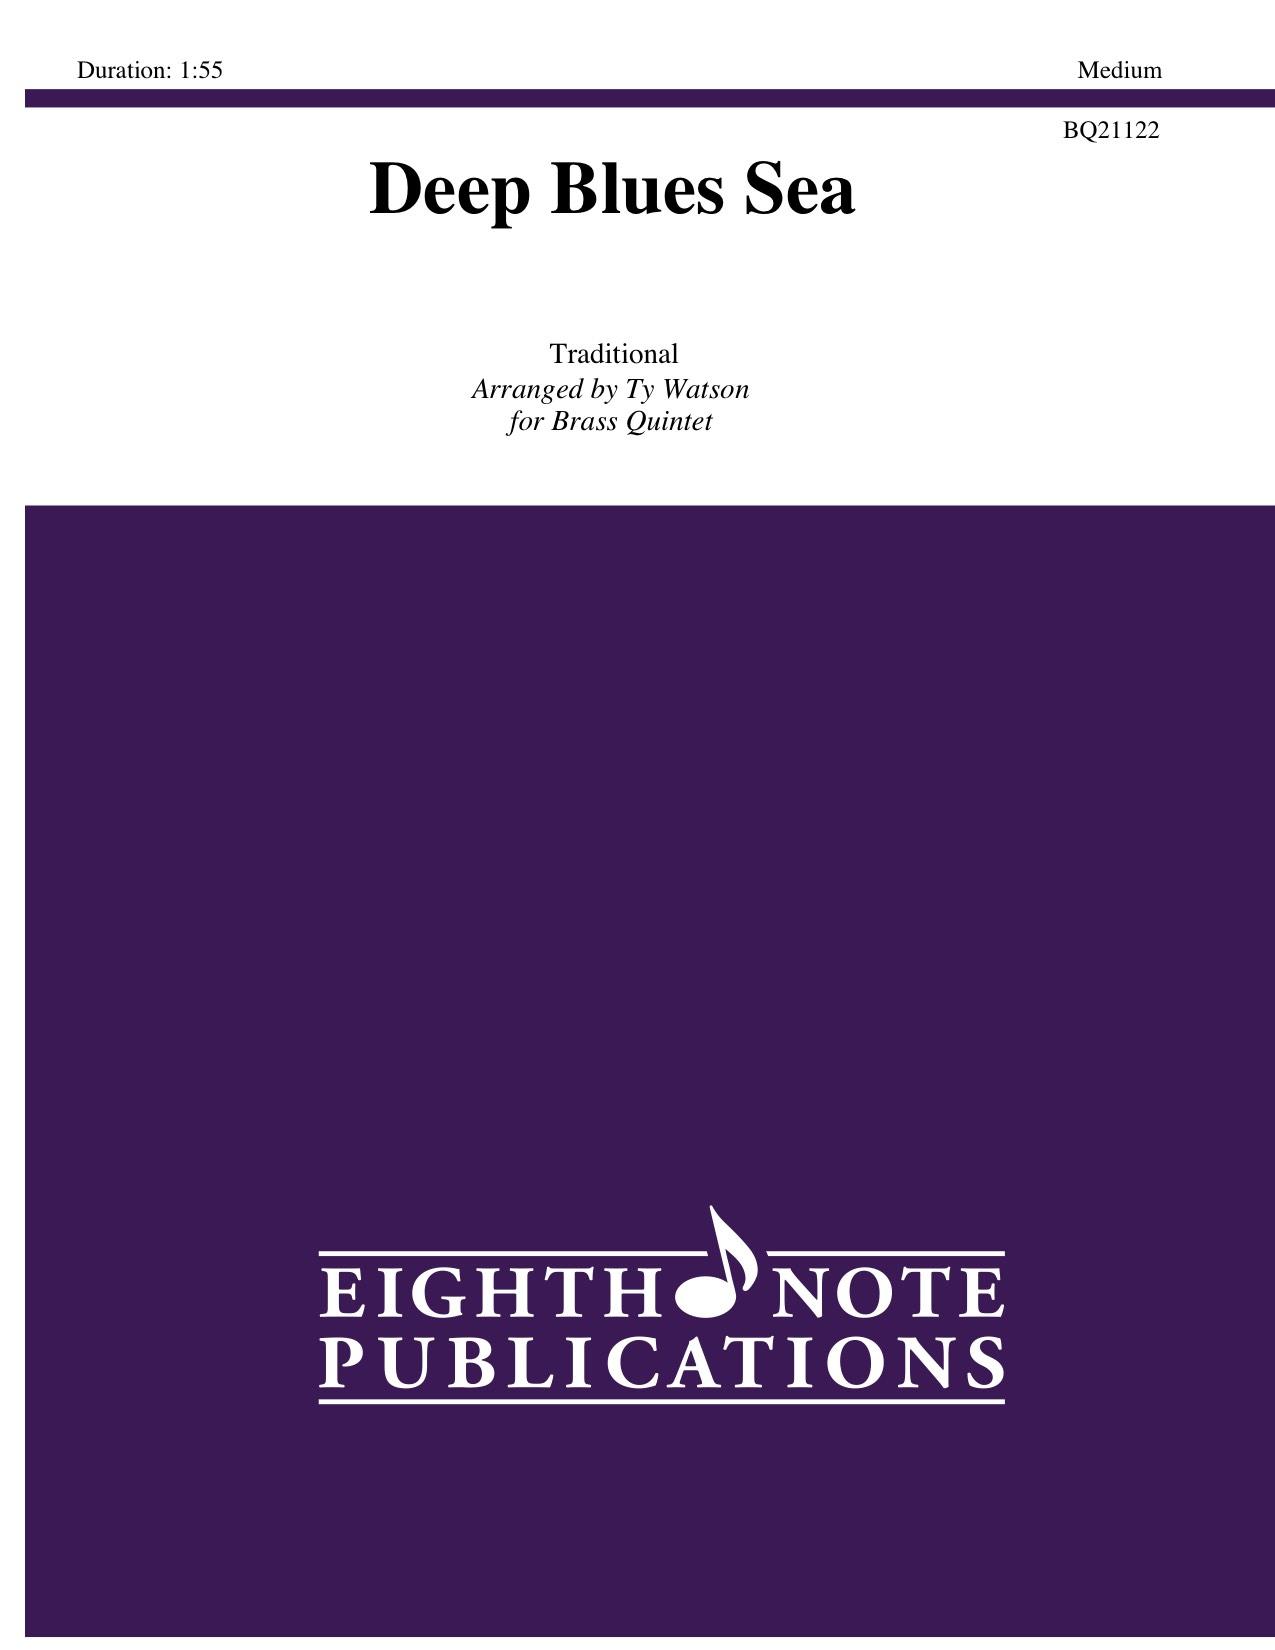 Deep Blues Sea -  Traditional